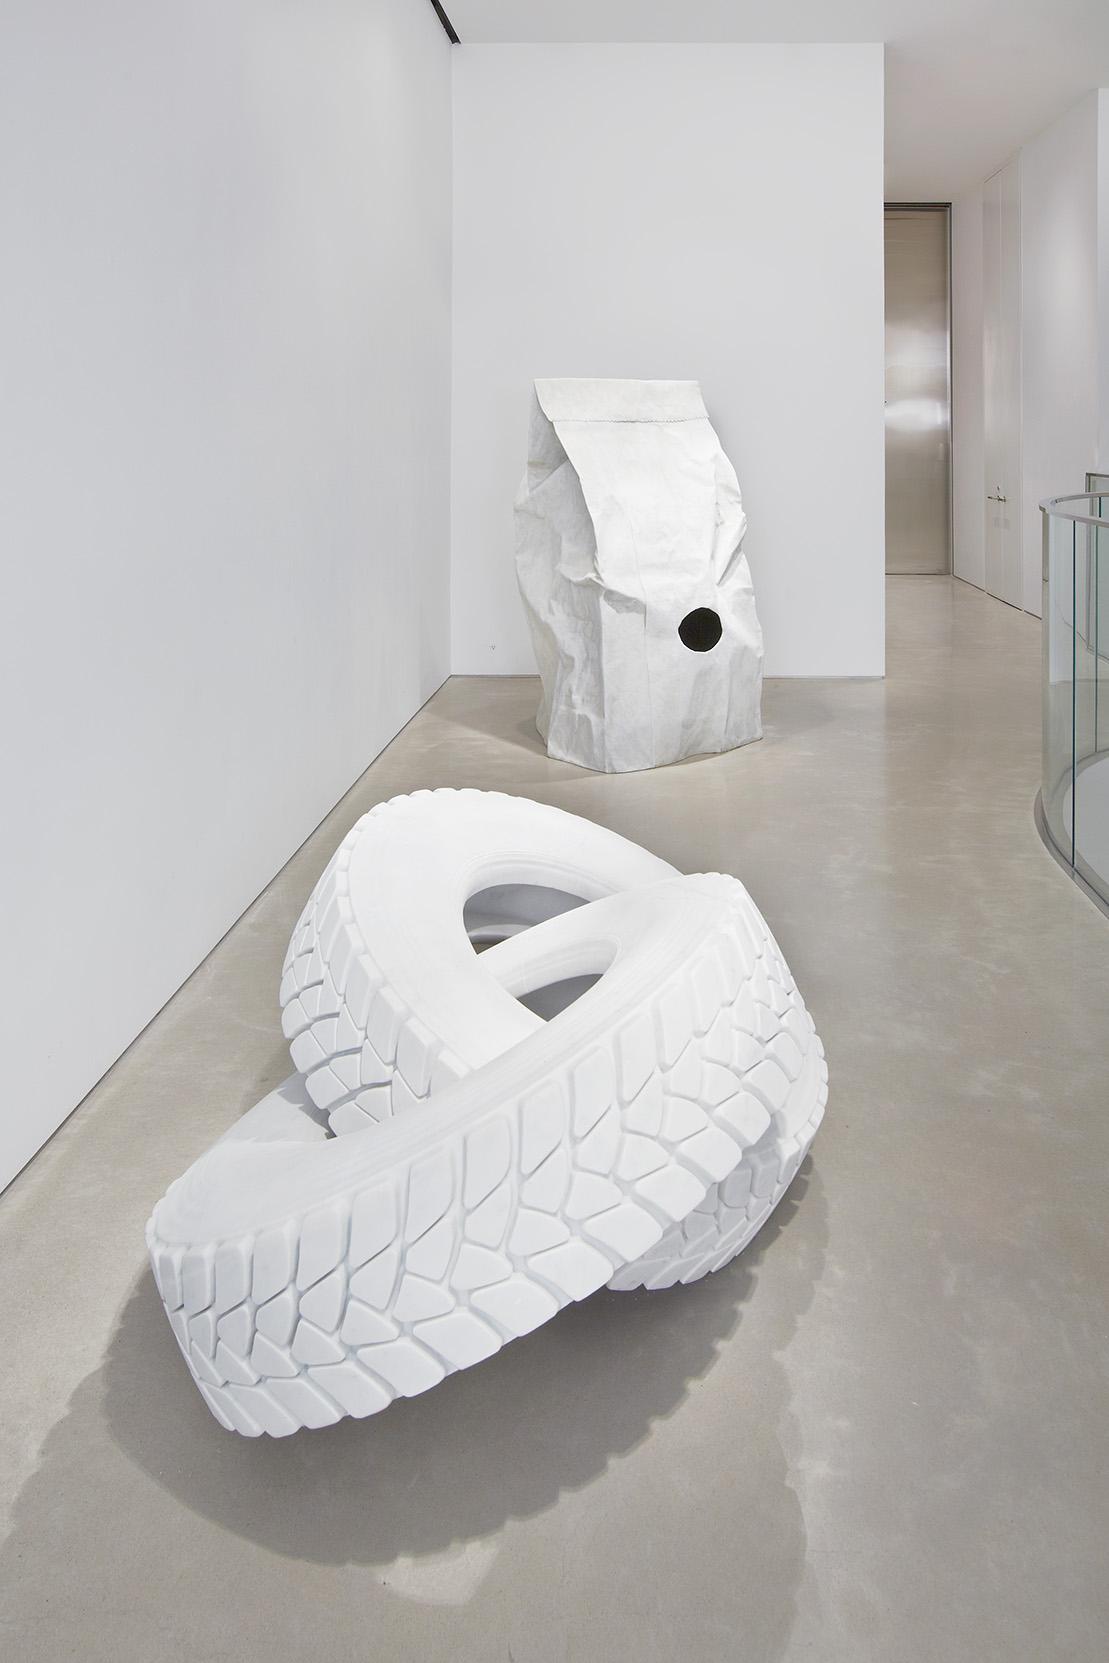 stargate sperone westwater marble marmo sculpture fabio viale infinite